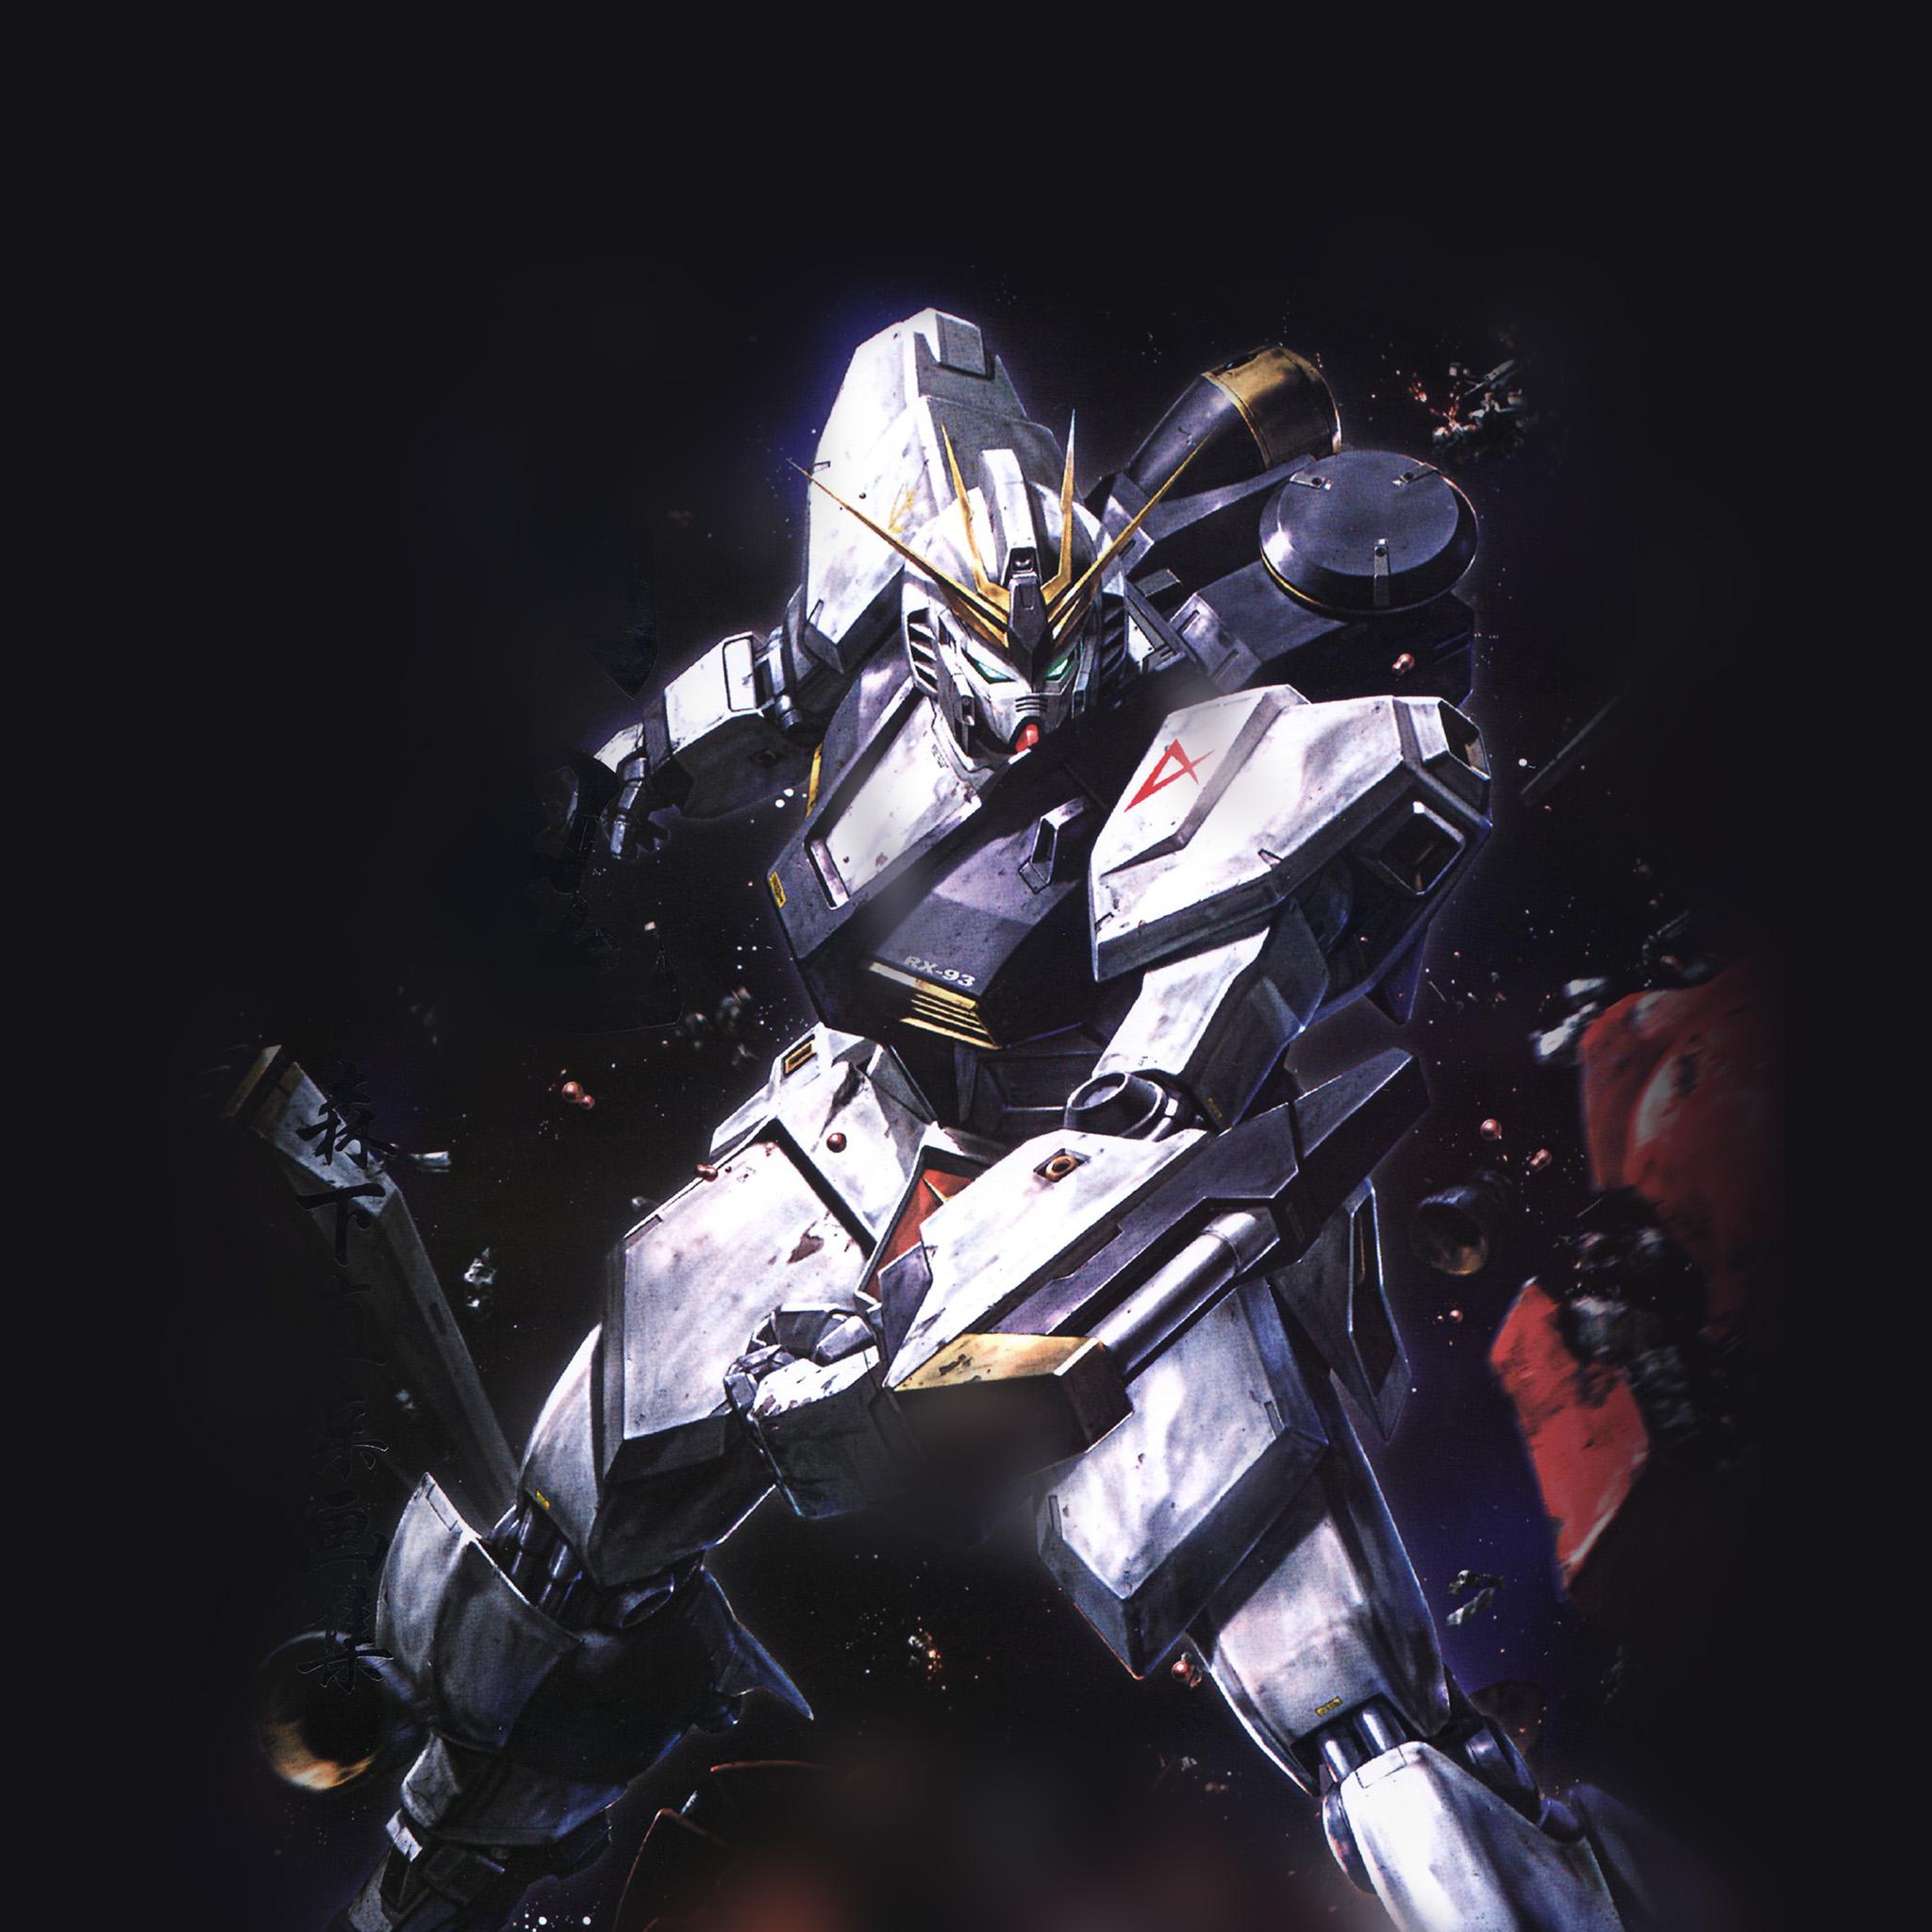 Gundam Iphone Wallpaper: WALLPAPERS